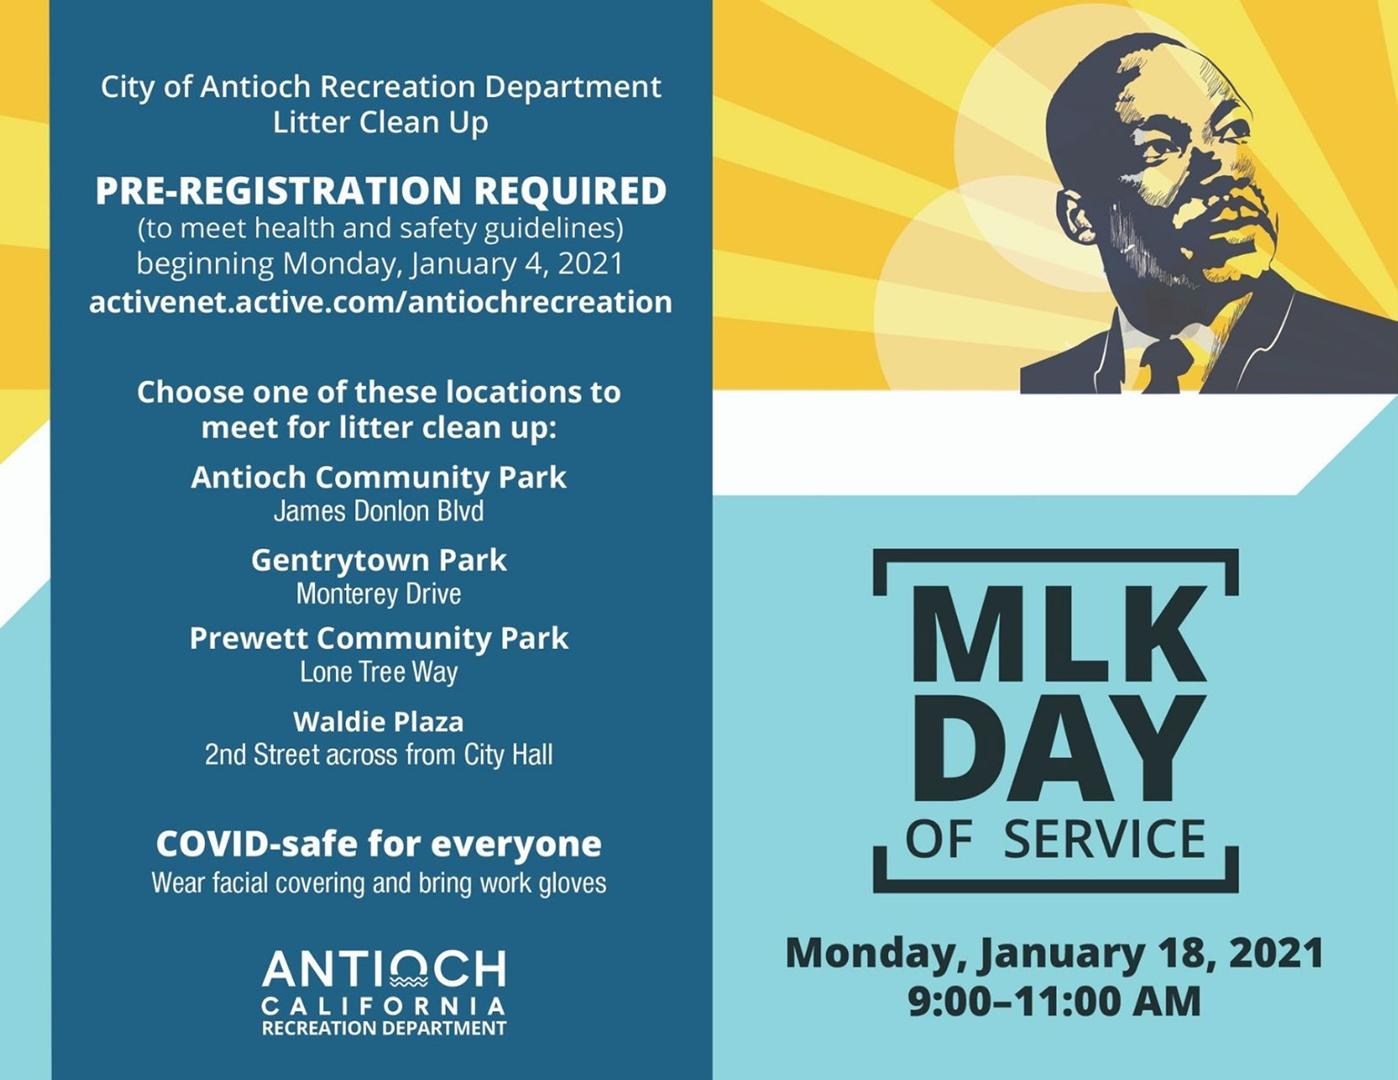 Antioch hosts MLK Day of Service Monday, Jan. 18 | Antioch ...